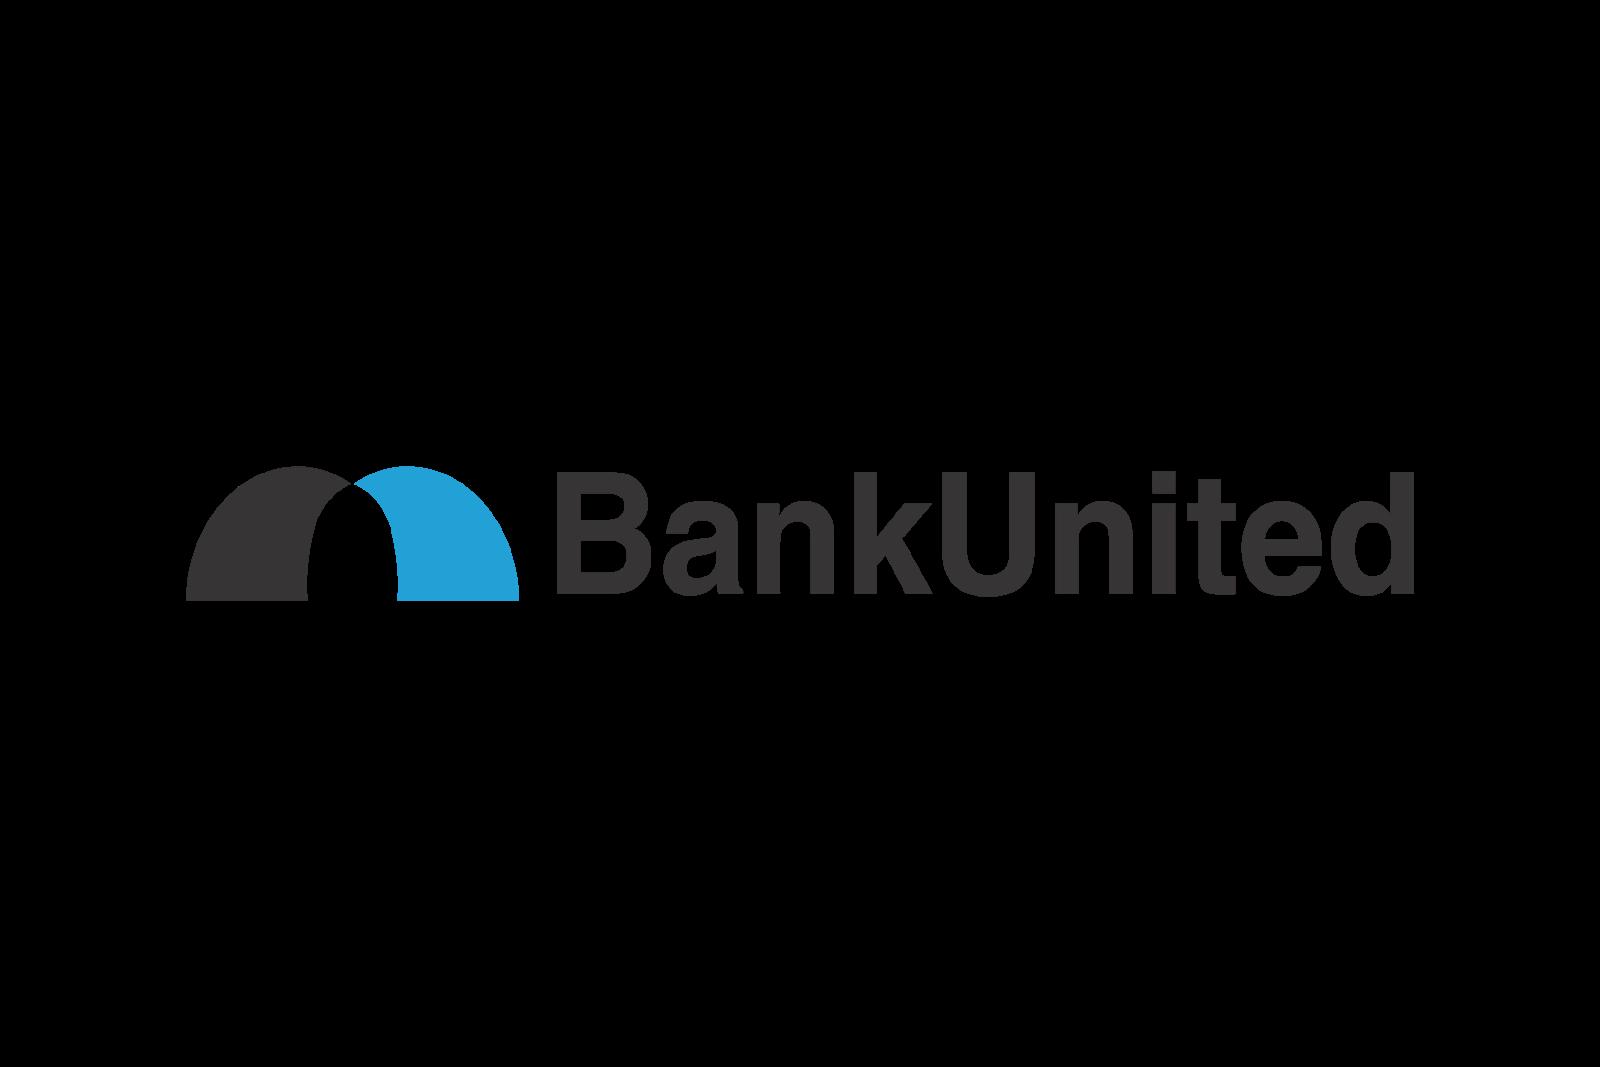 BankUnited Logo photo - 1